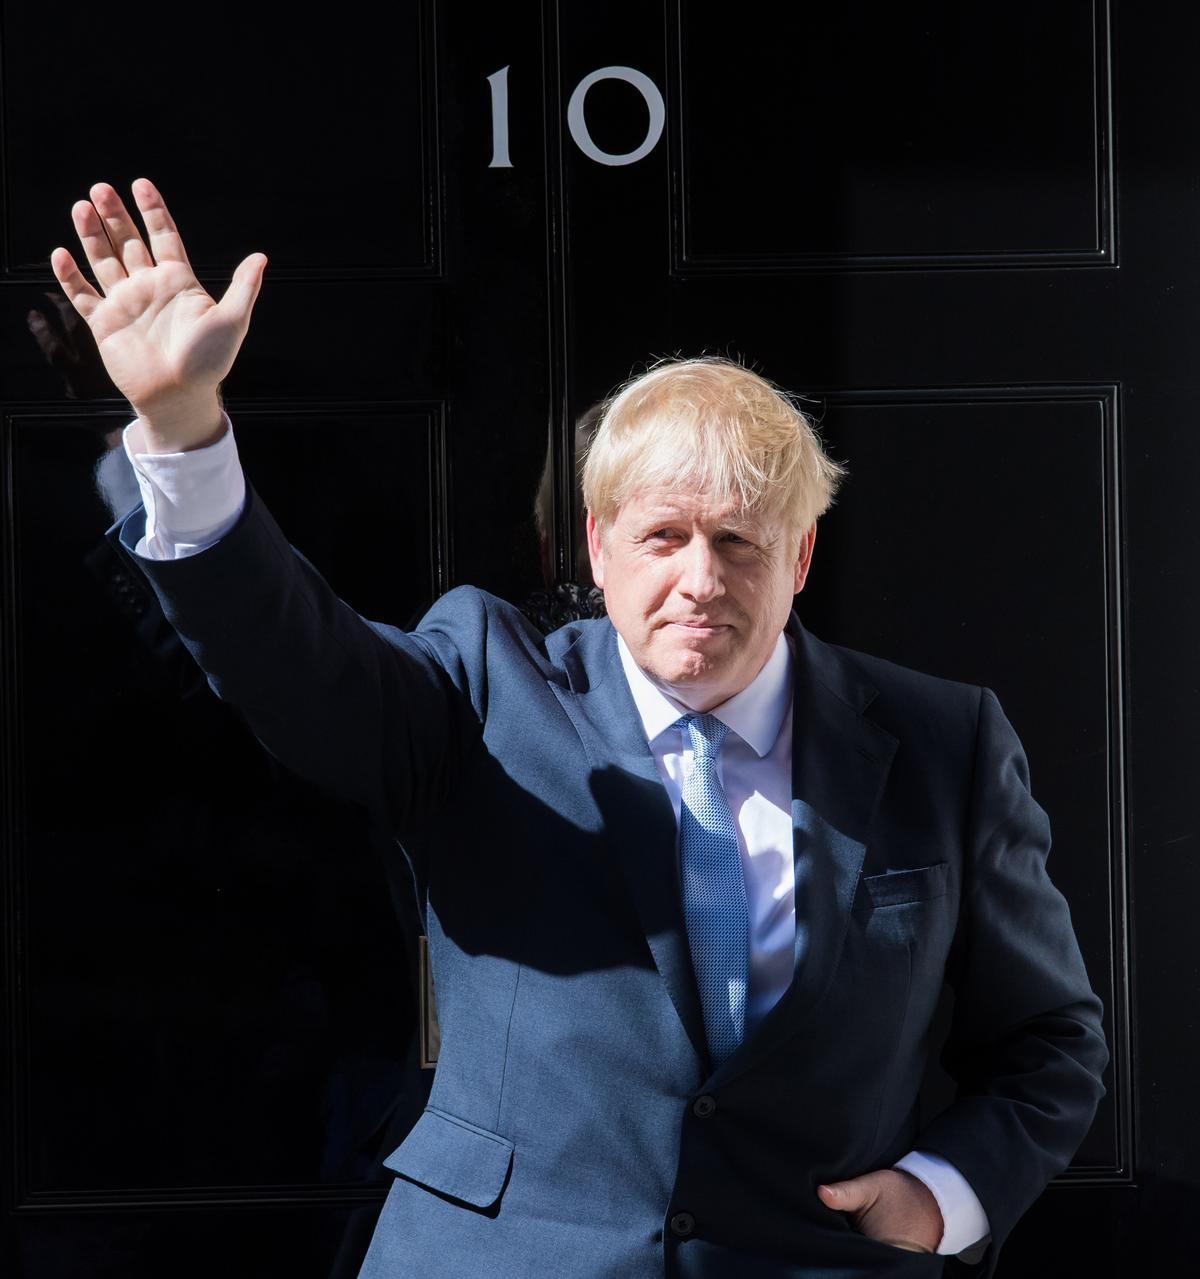 Johnson became Prime Minister on 24 July